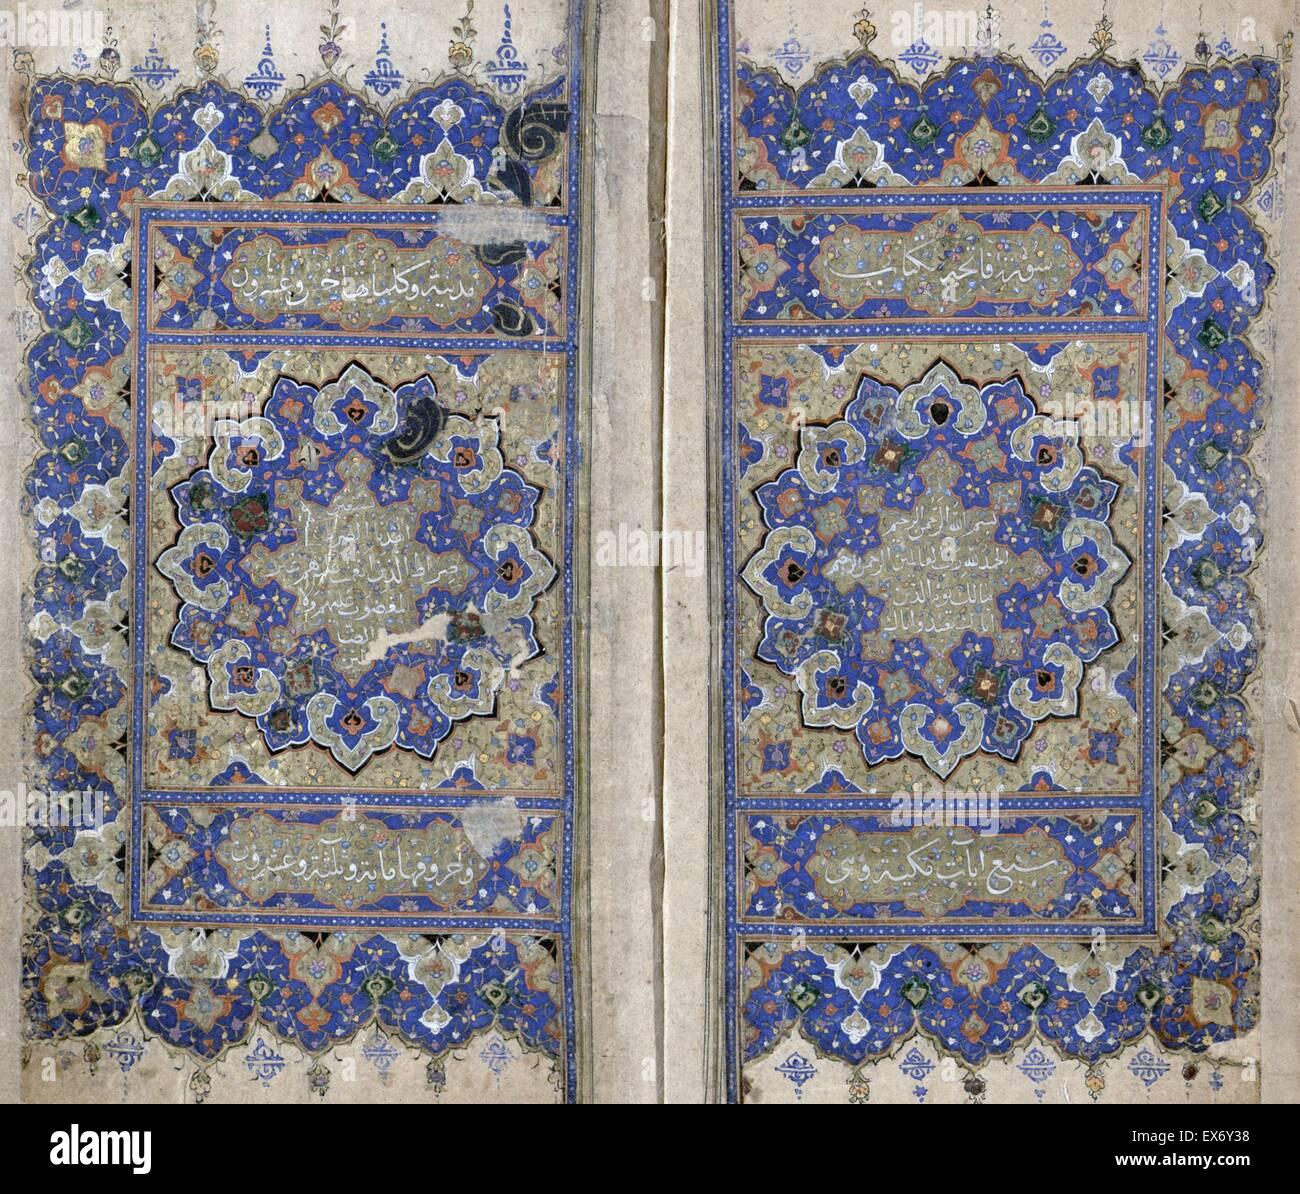 Iranian Qur'an from 1614, written in Naskh script by the calligrapher, 'Imad al-Din. B. Ibrahim-al-Shirazi. - Stock Image